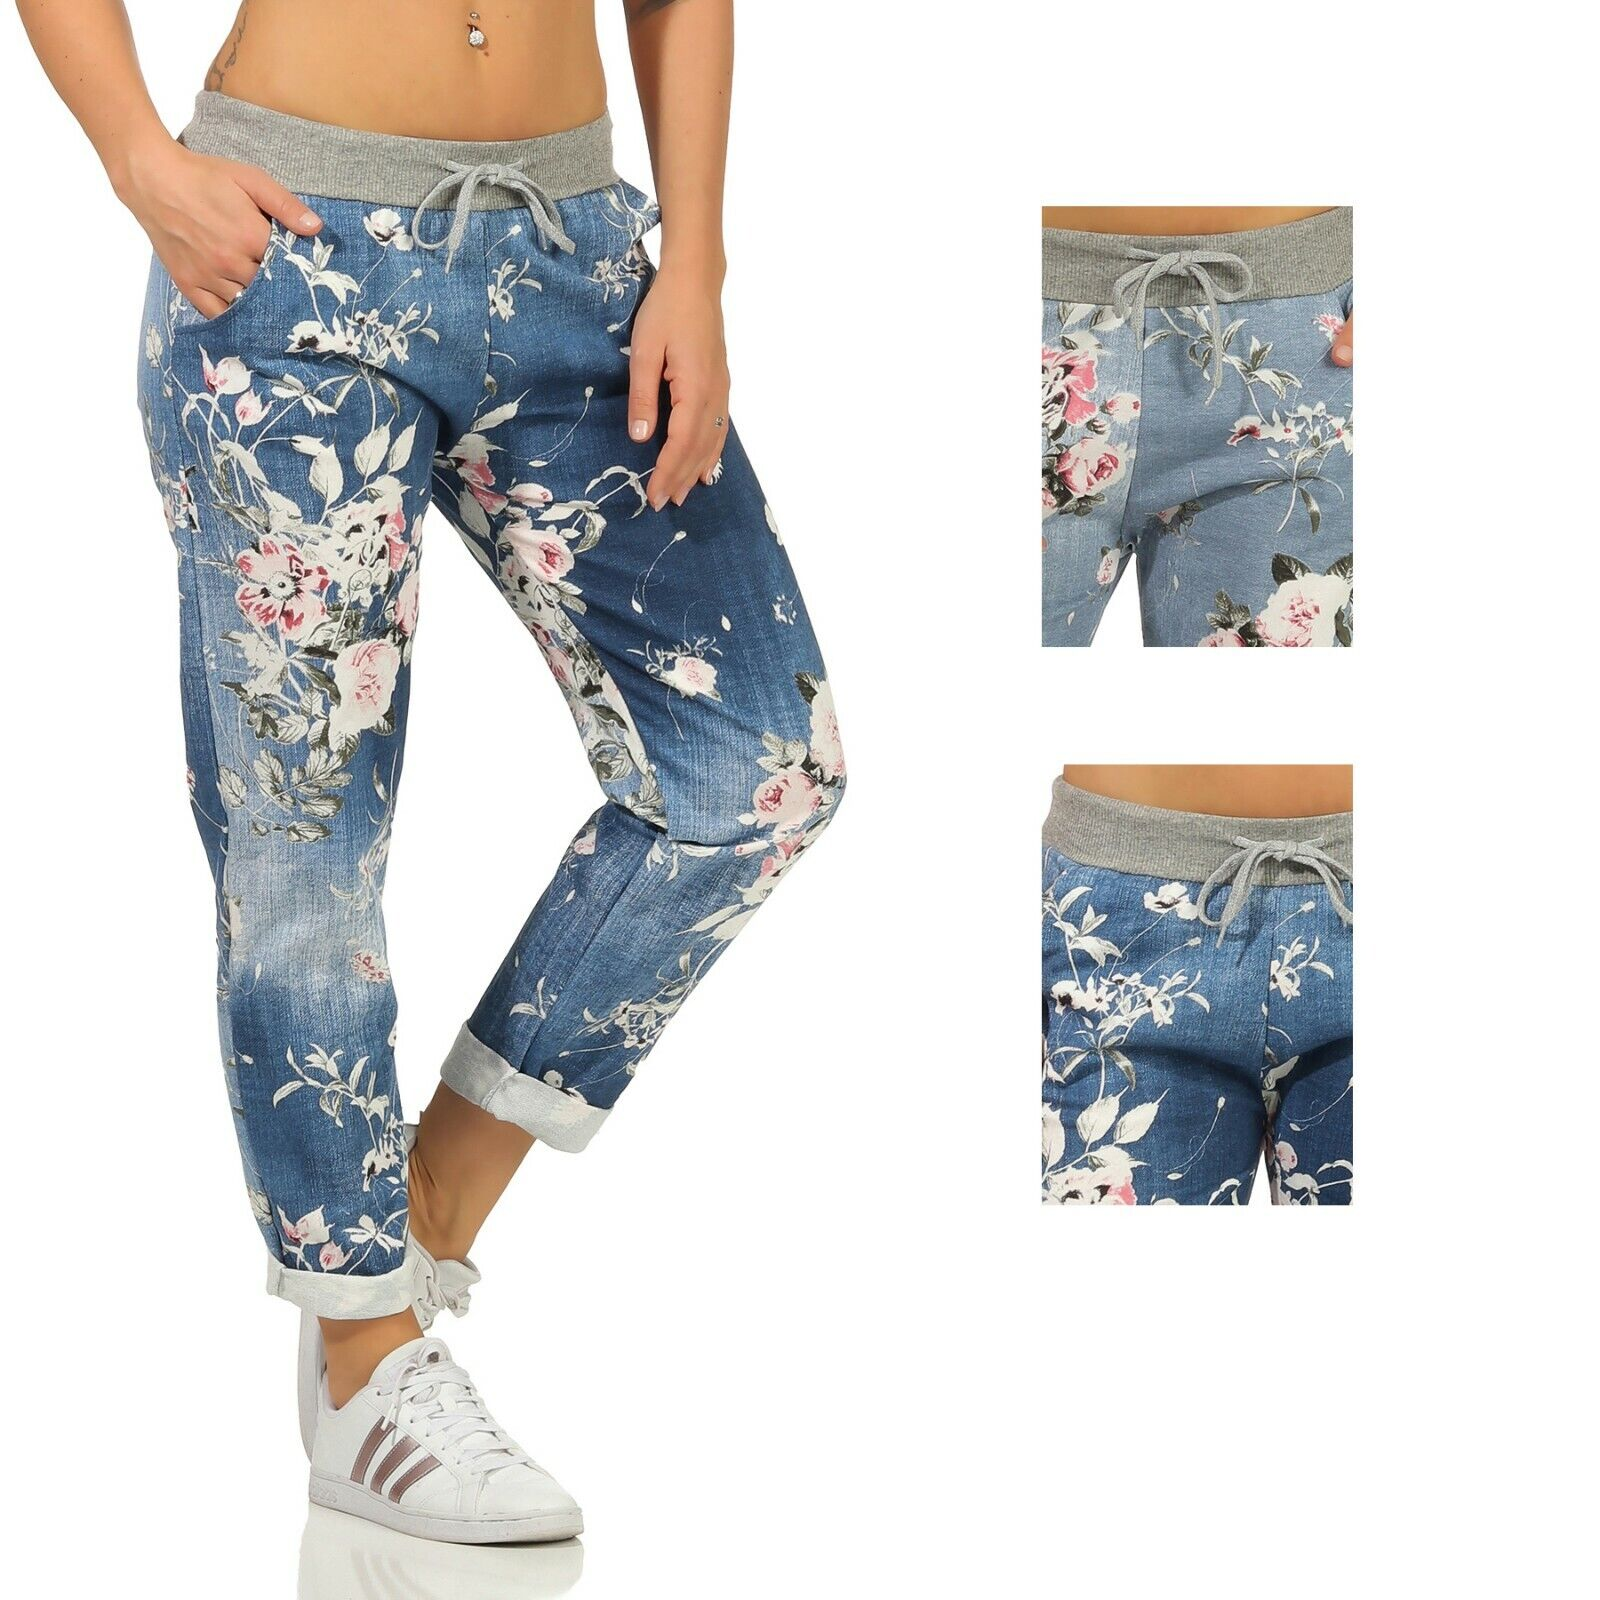 Sweathose Damen Sport Freizeit Hose Jeans-Druck leichte Jogginghose JOGPANTS